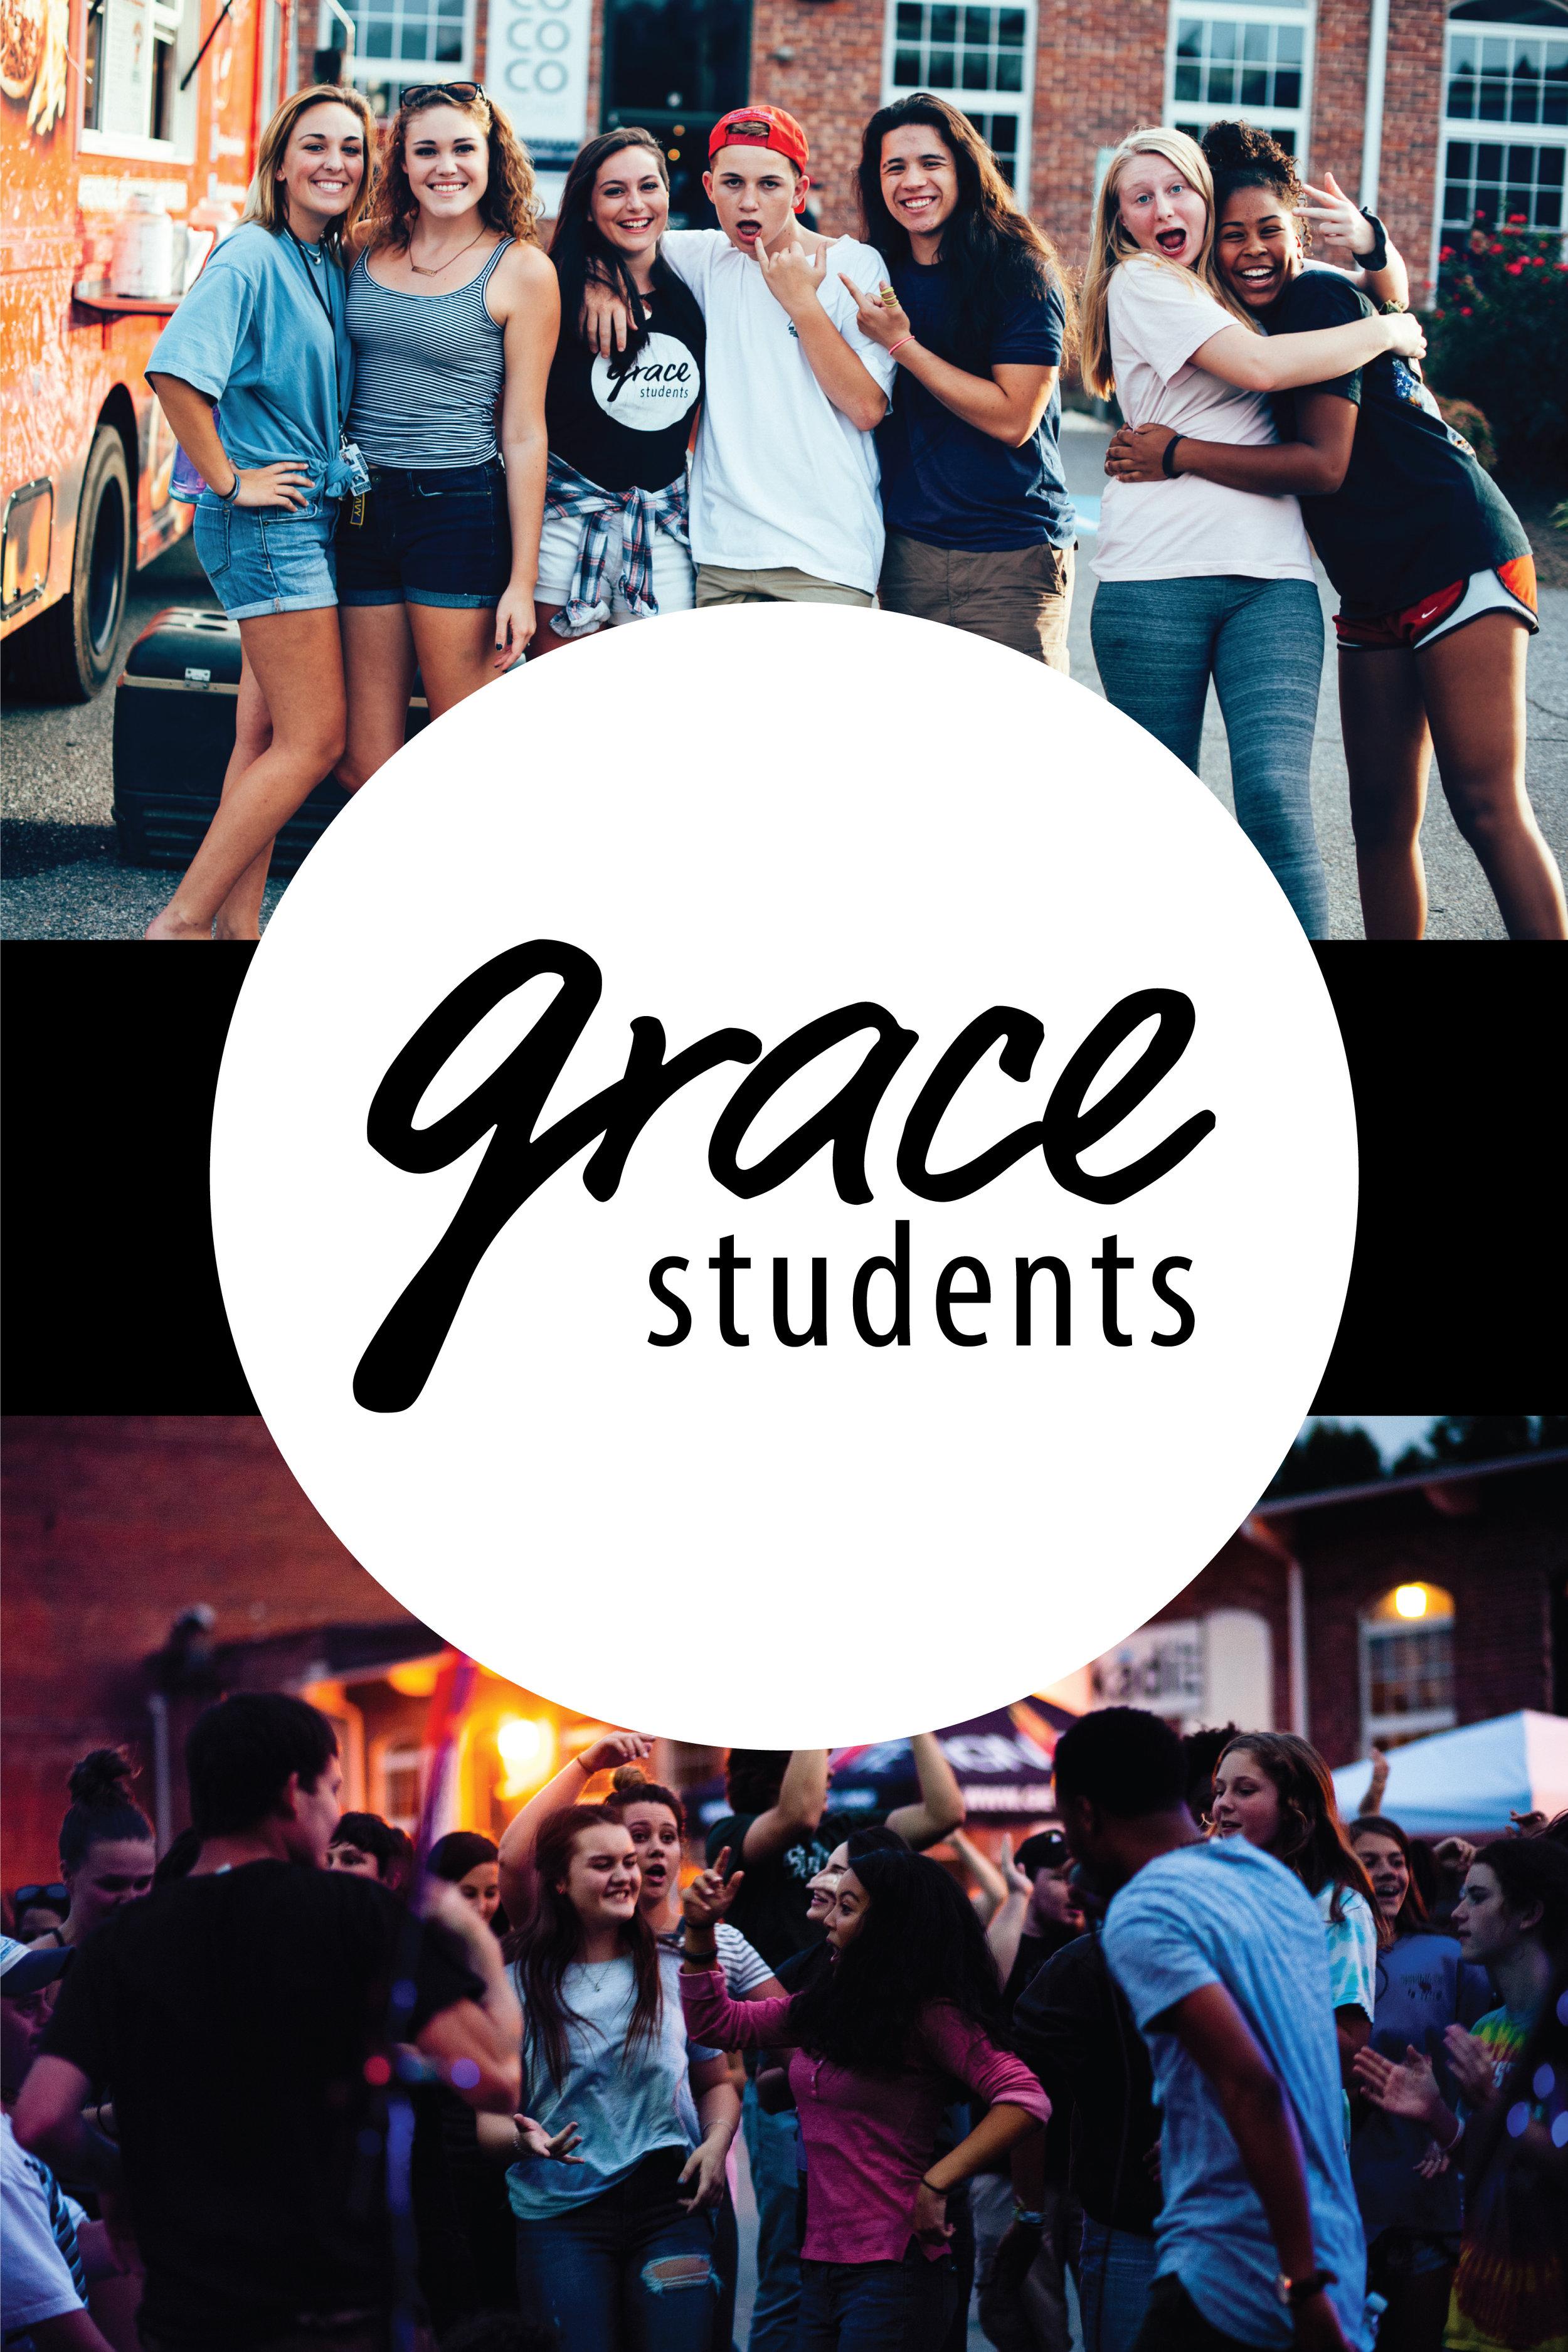 grace-students_Poster1.jpg